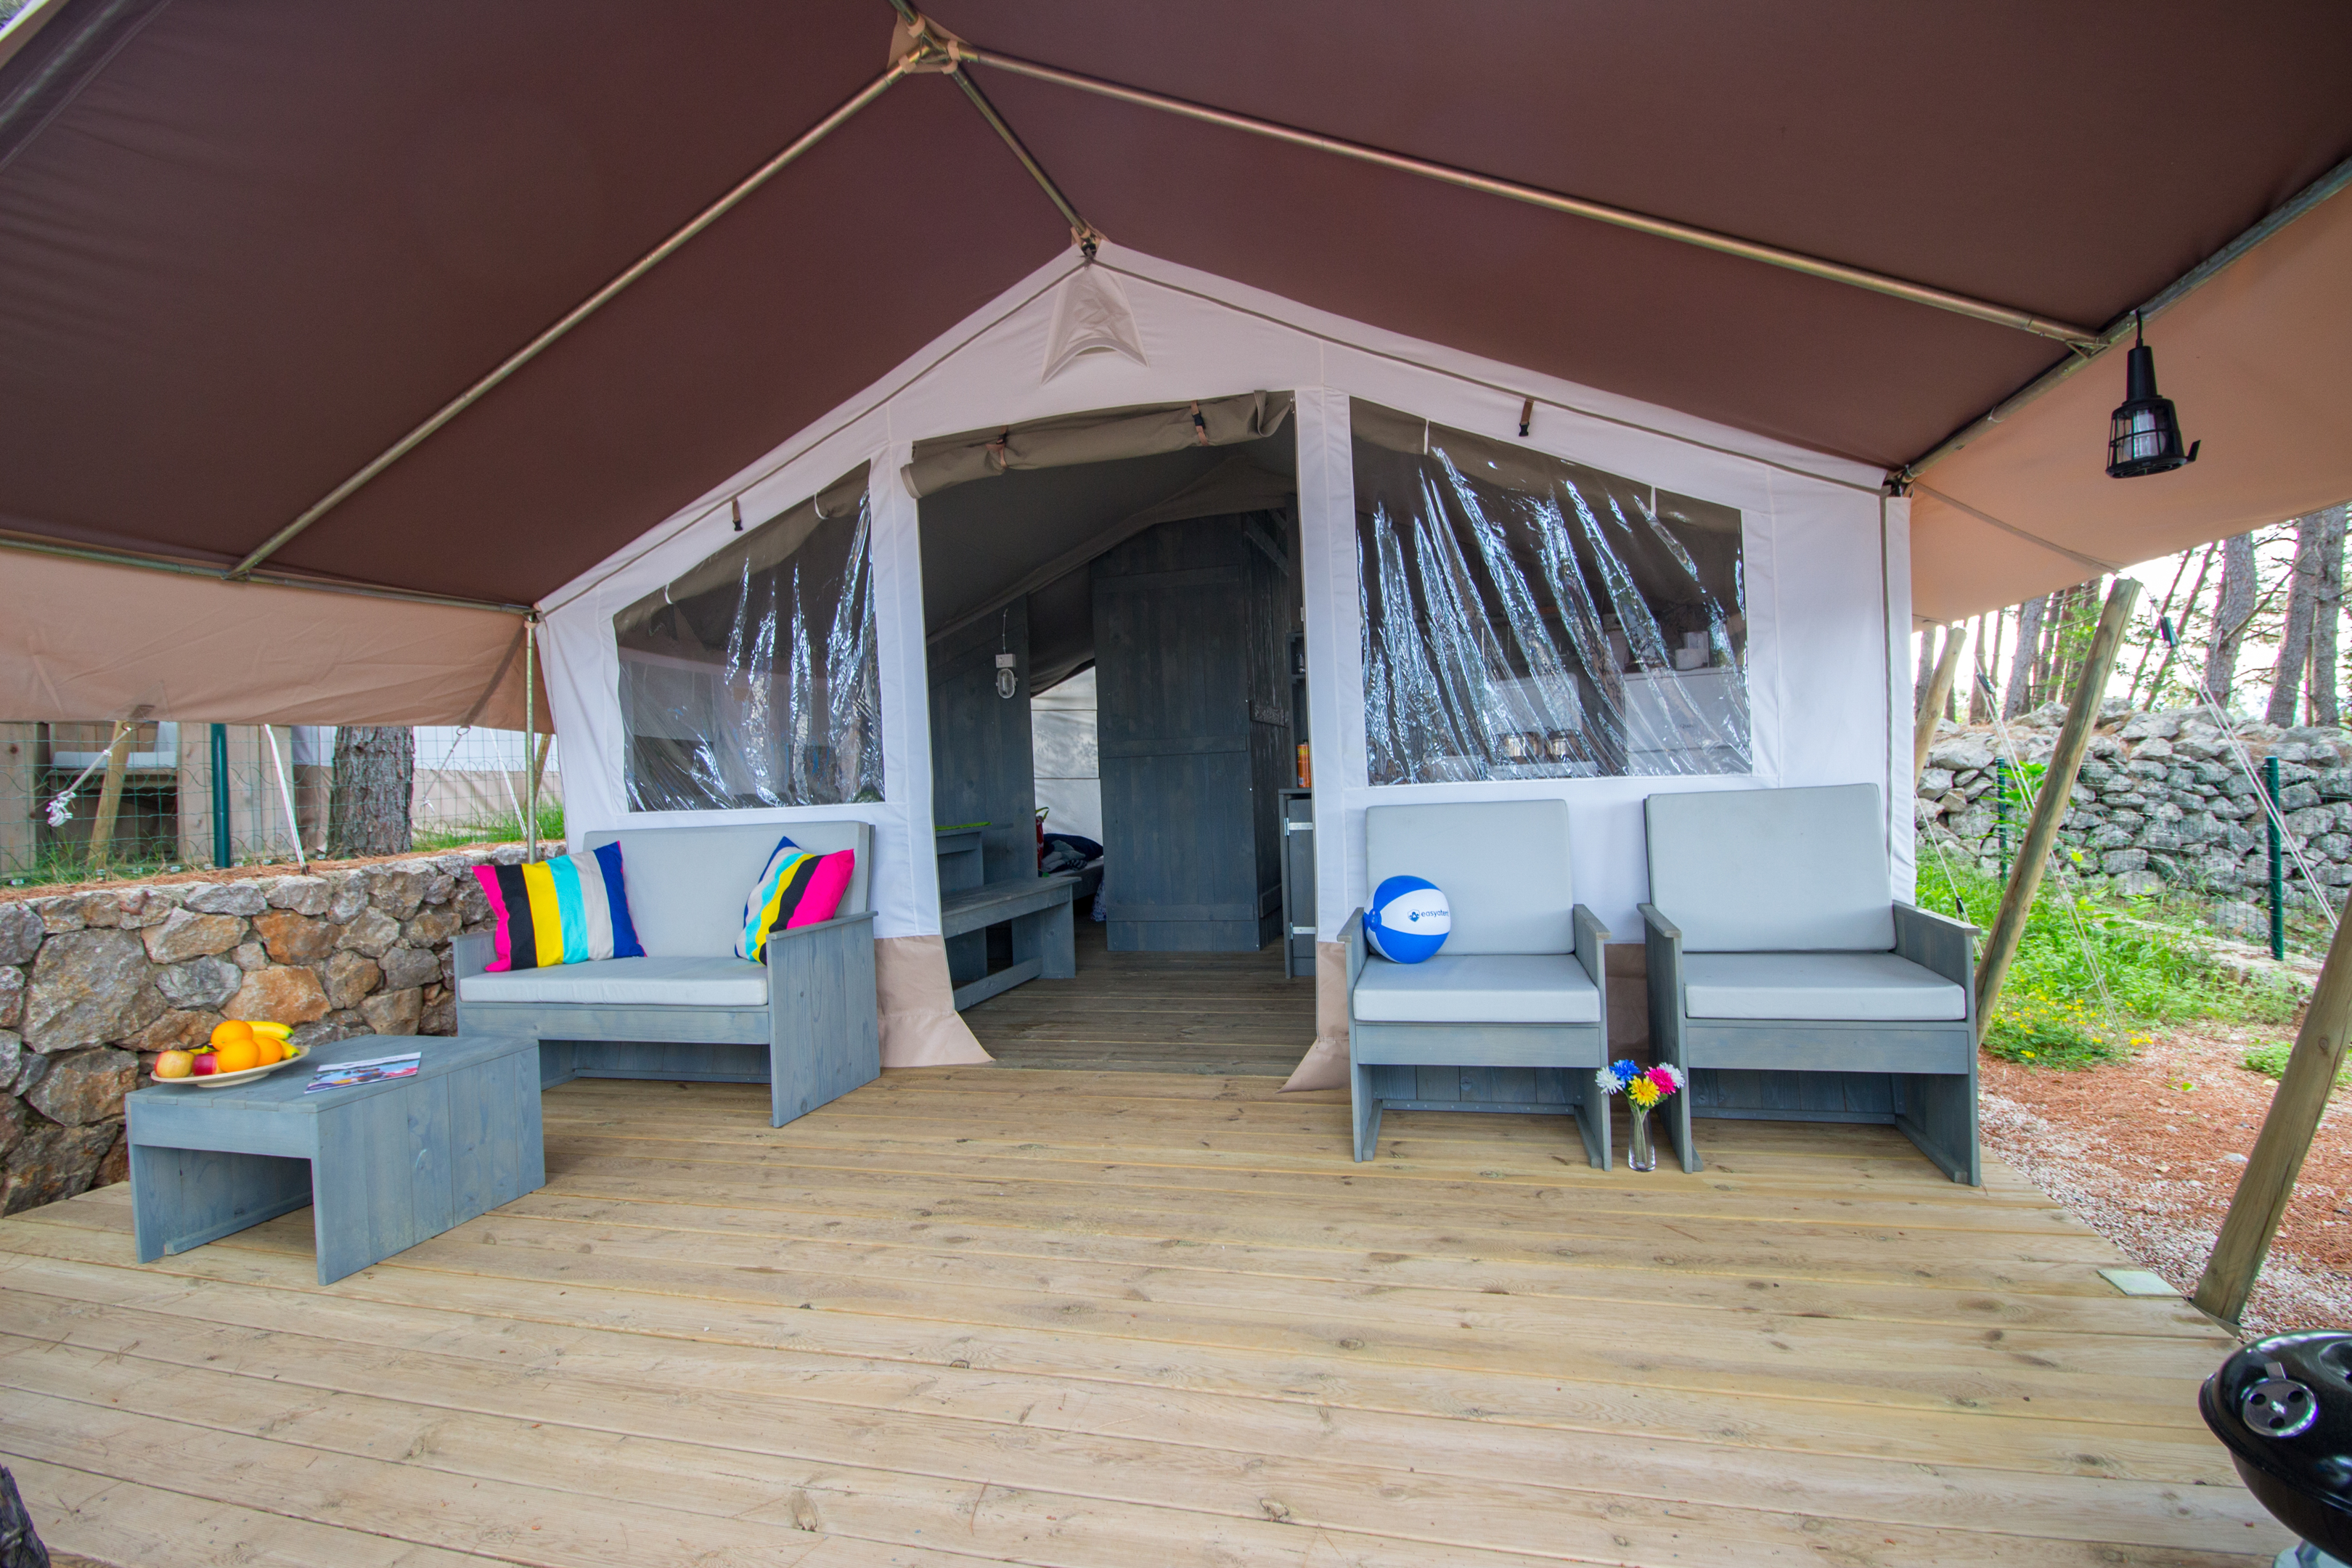 Safaritent Croatia | Luxury camping holiday | Easyatent